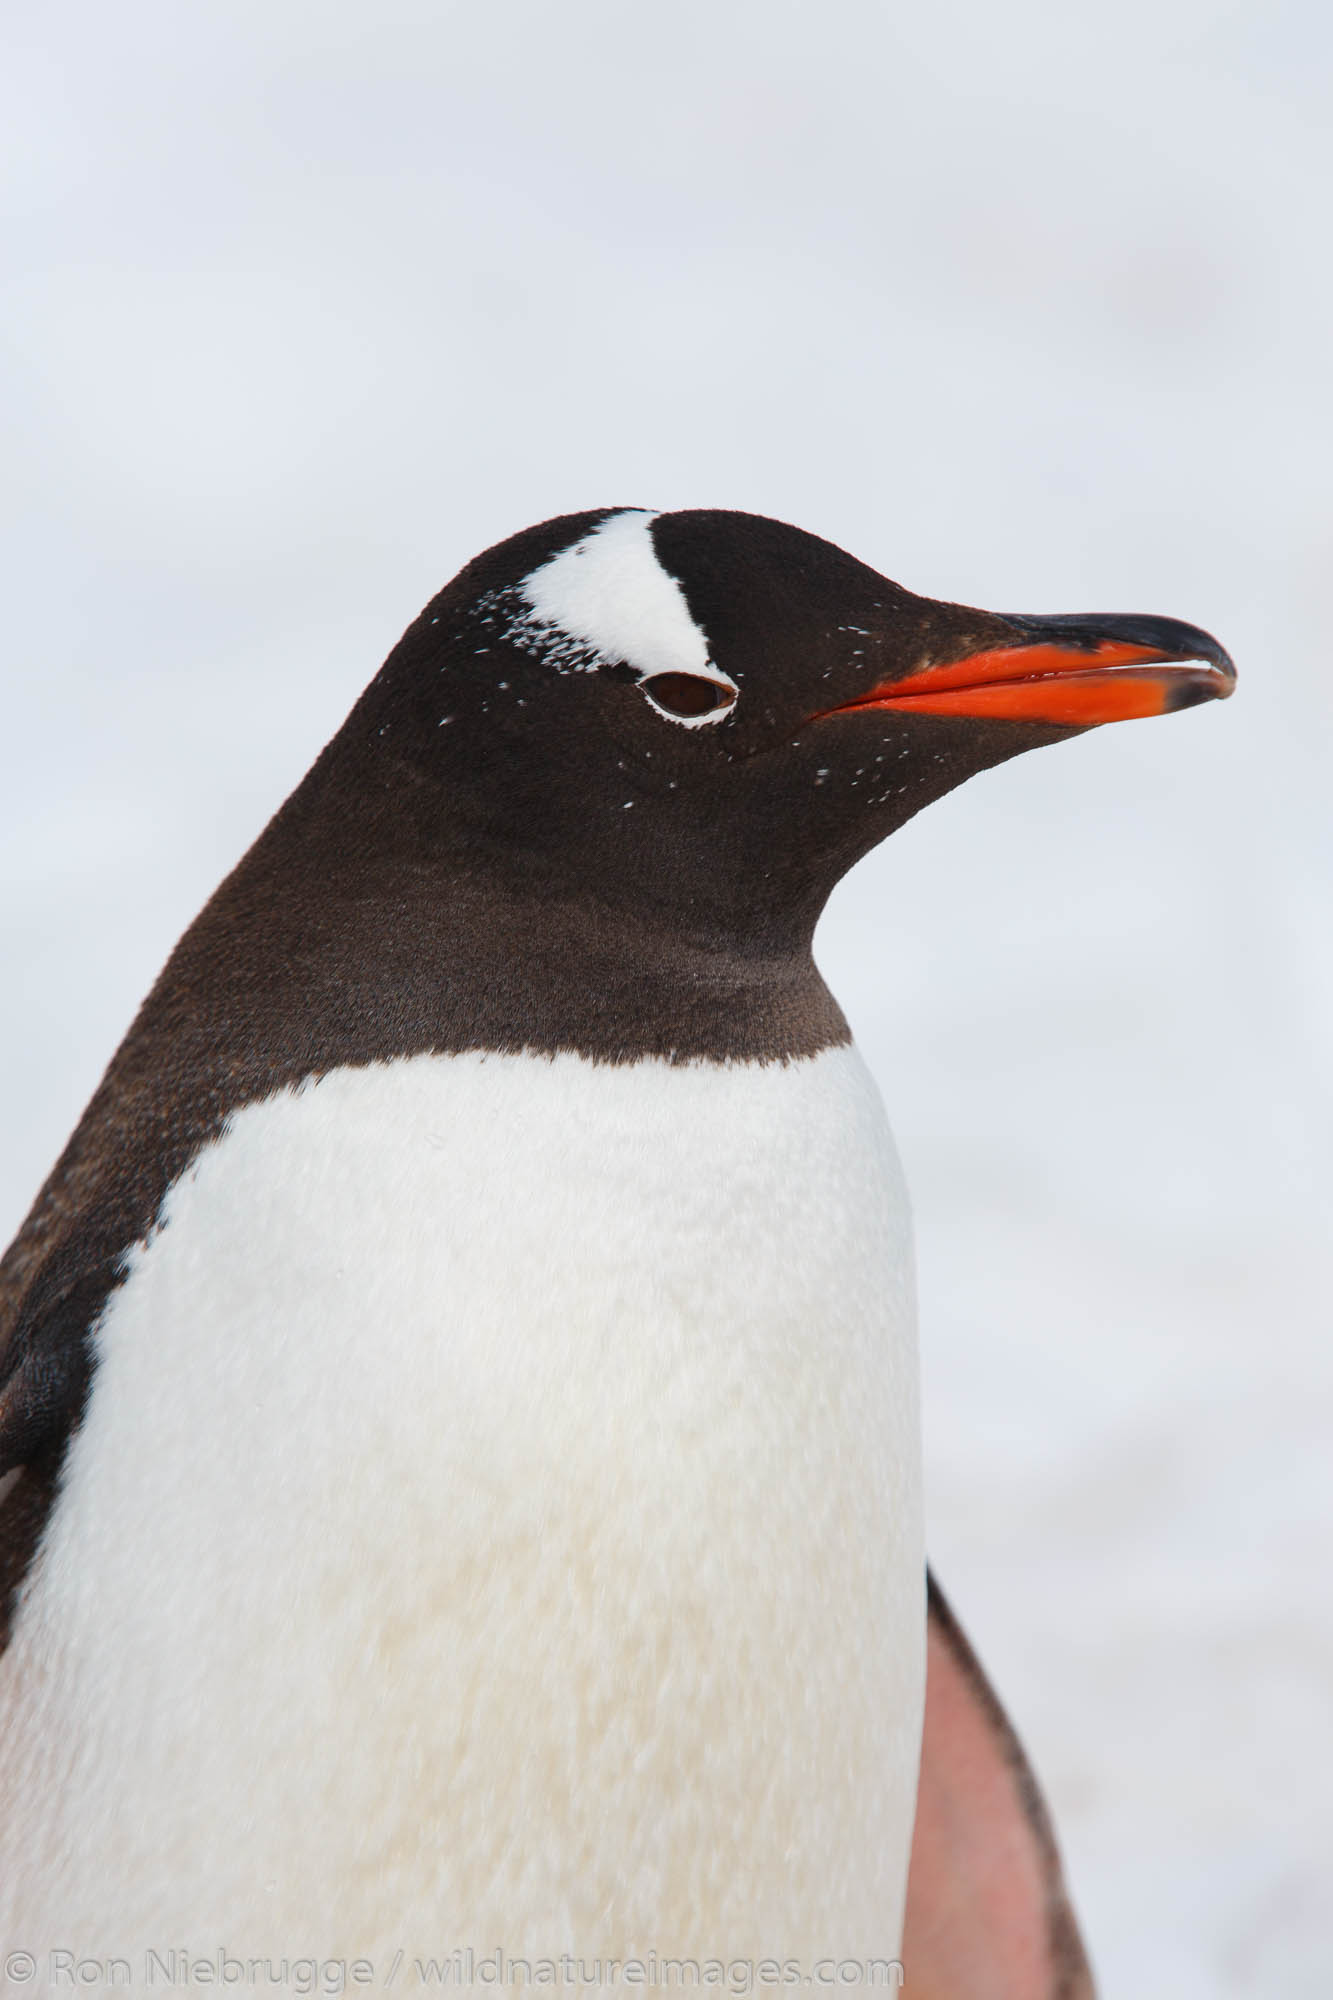 A Gentoo Penguin (Pygoscelis papua) on Cuverville Island, Antarctica.